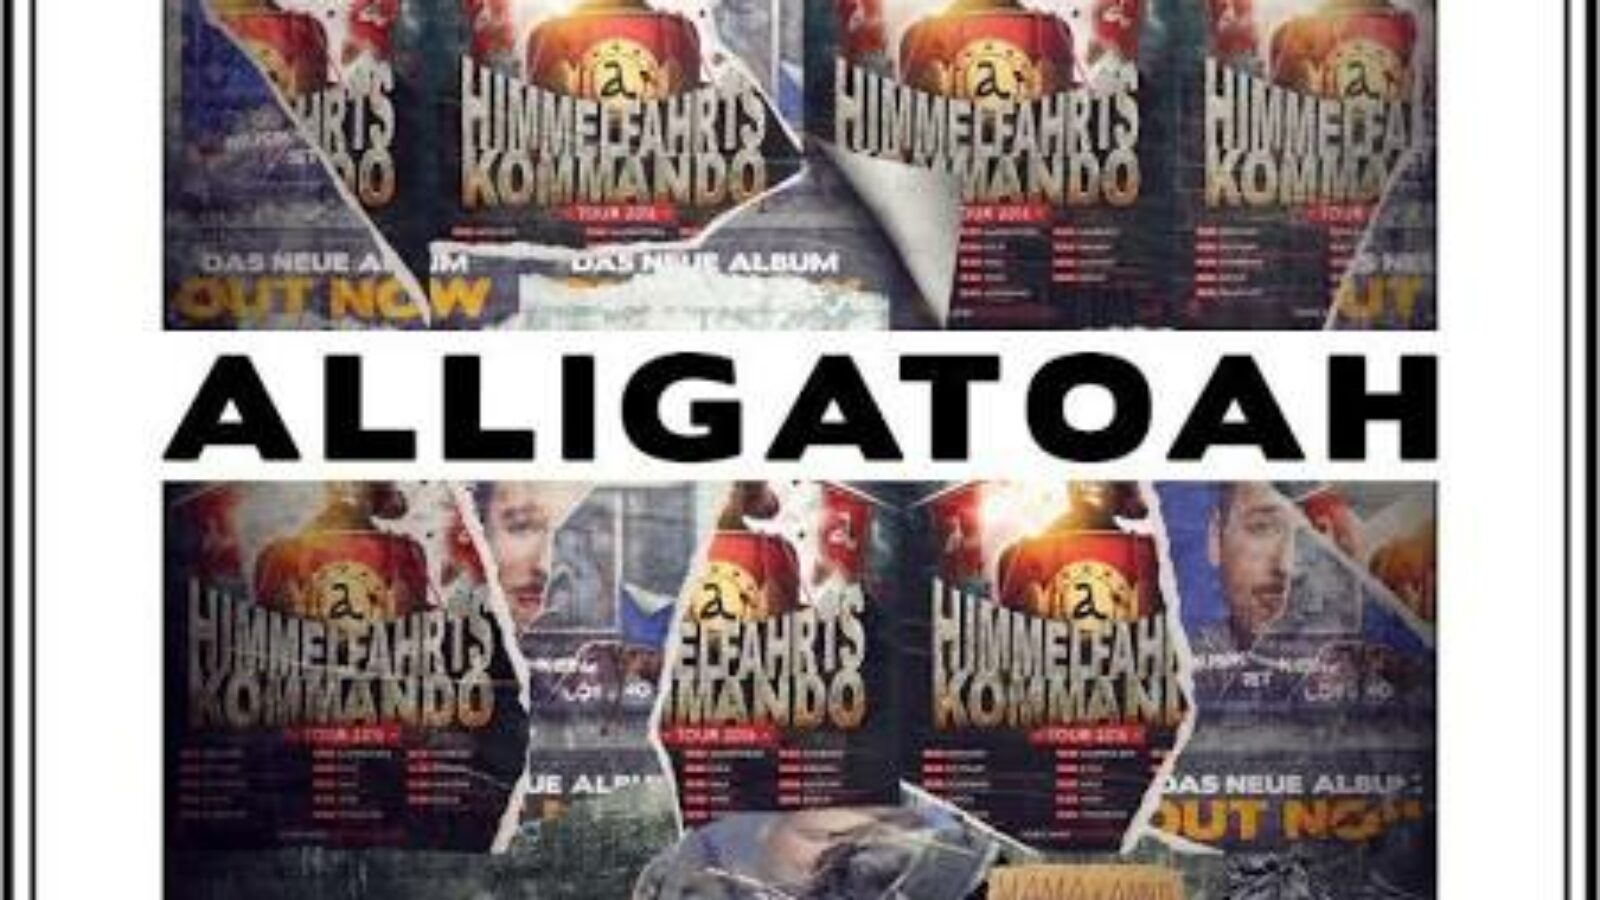 OXMOX CD-Tipp: ALLIGATOAH – Livemusik Ist Keine Lösung: Himmelfahrtskommando Tour